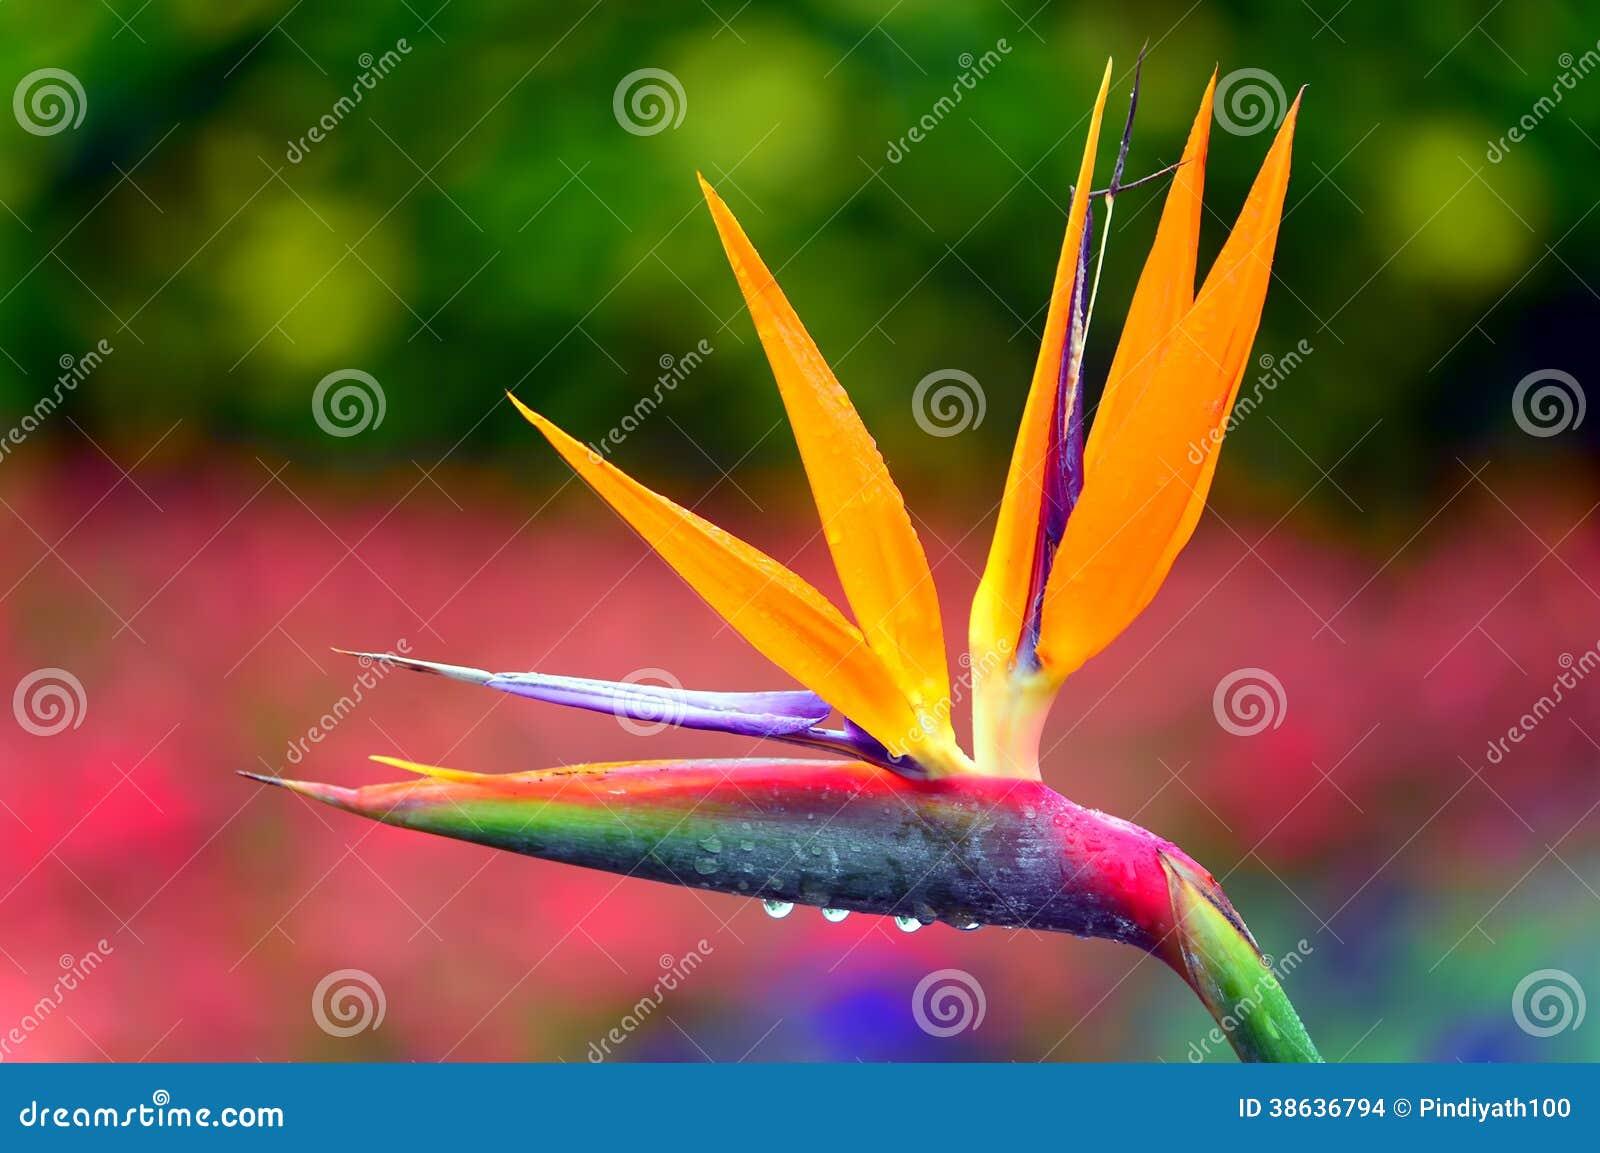 Bird Stock Photos - Royalty Free Pictures